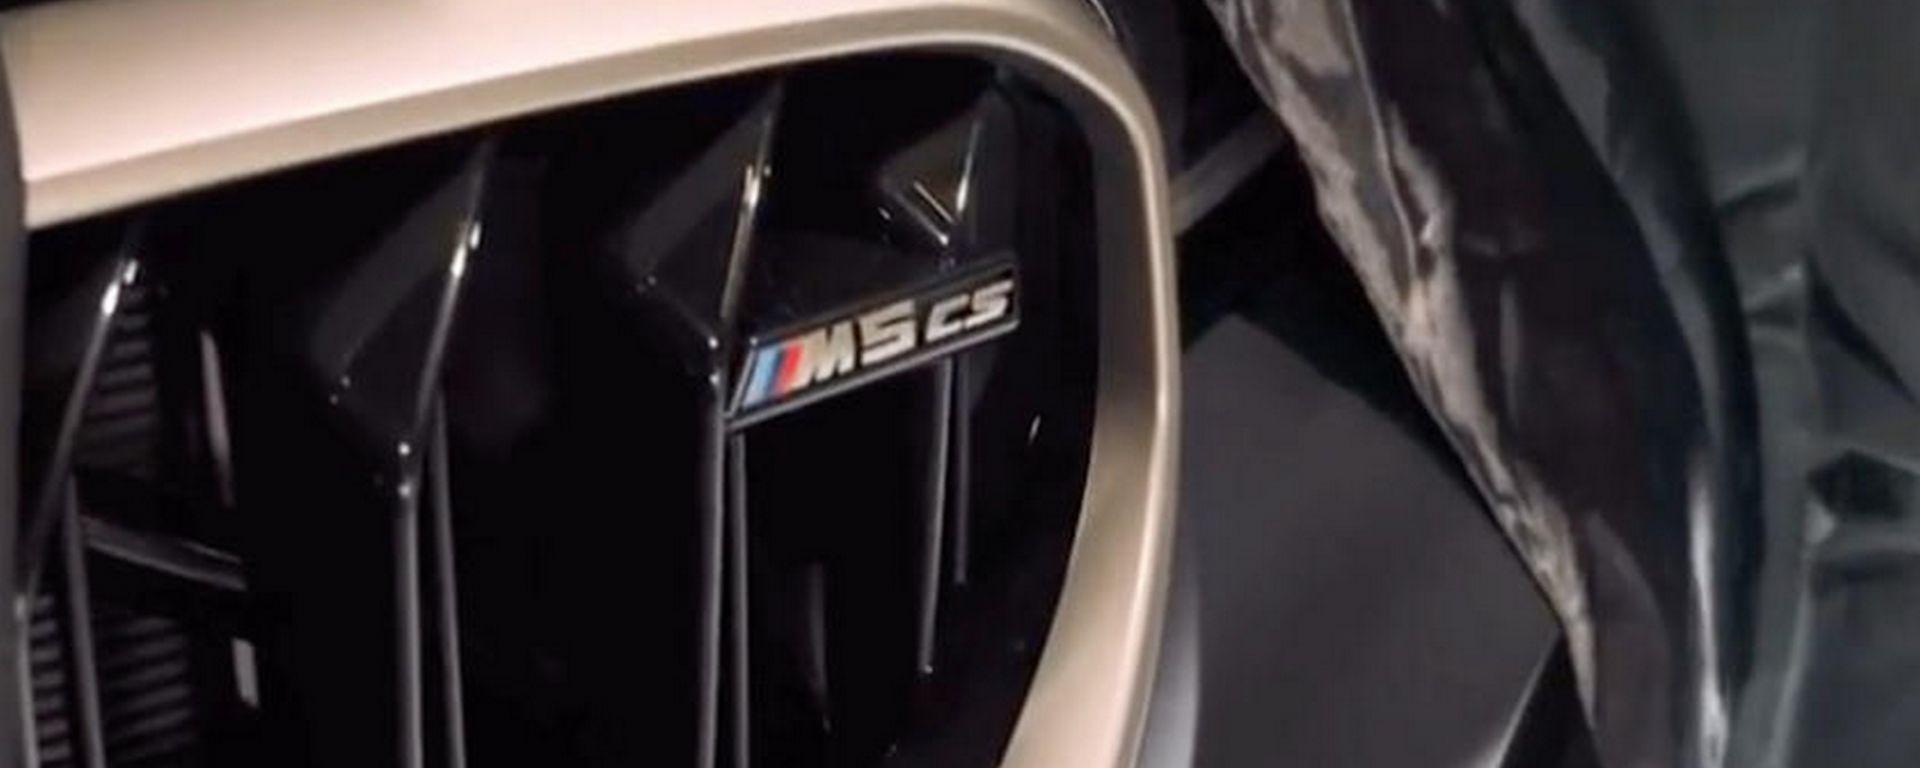 Nuova BMW M5 CS, appuntamento a gennaio 2021